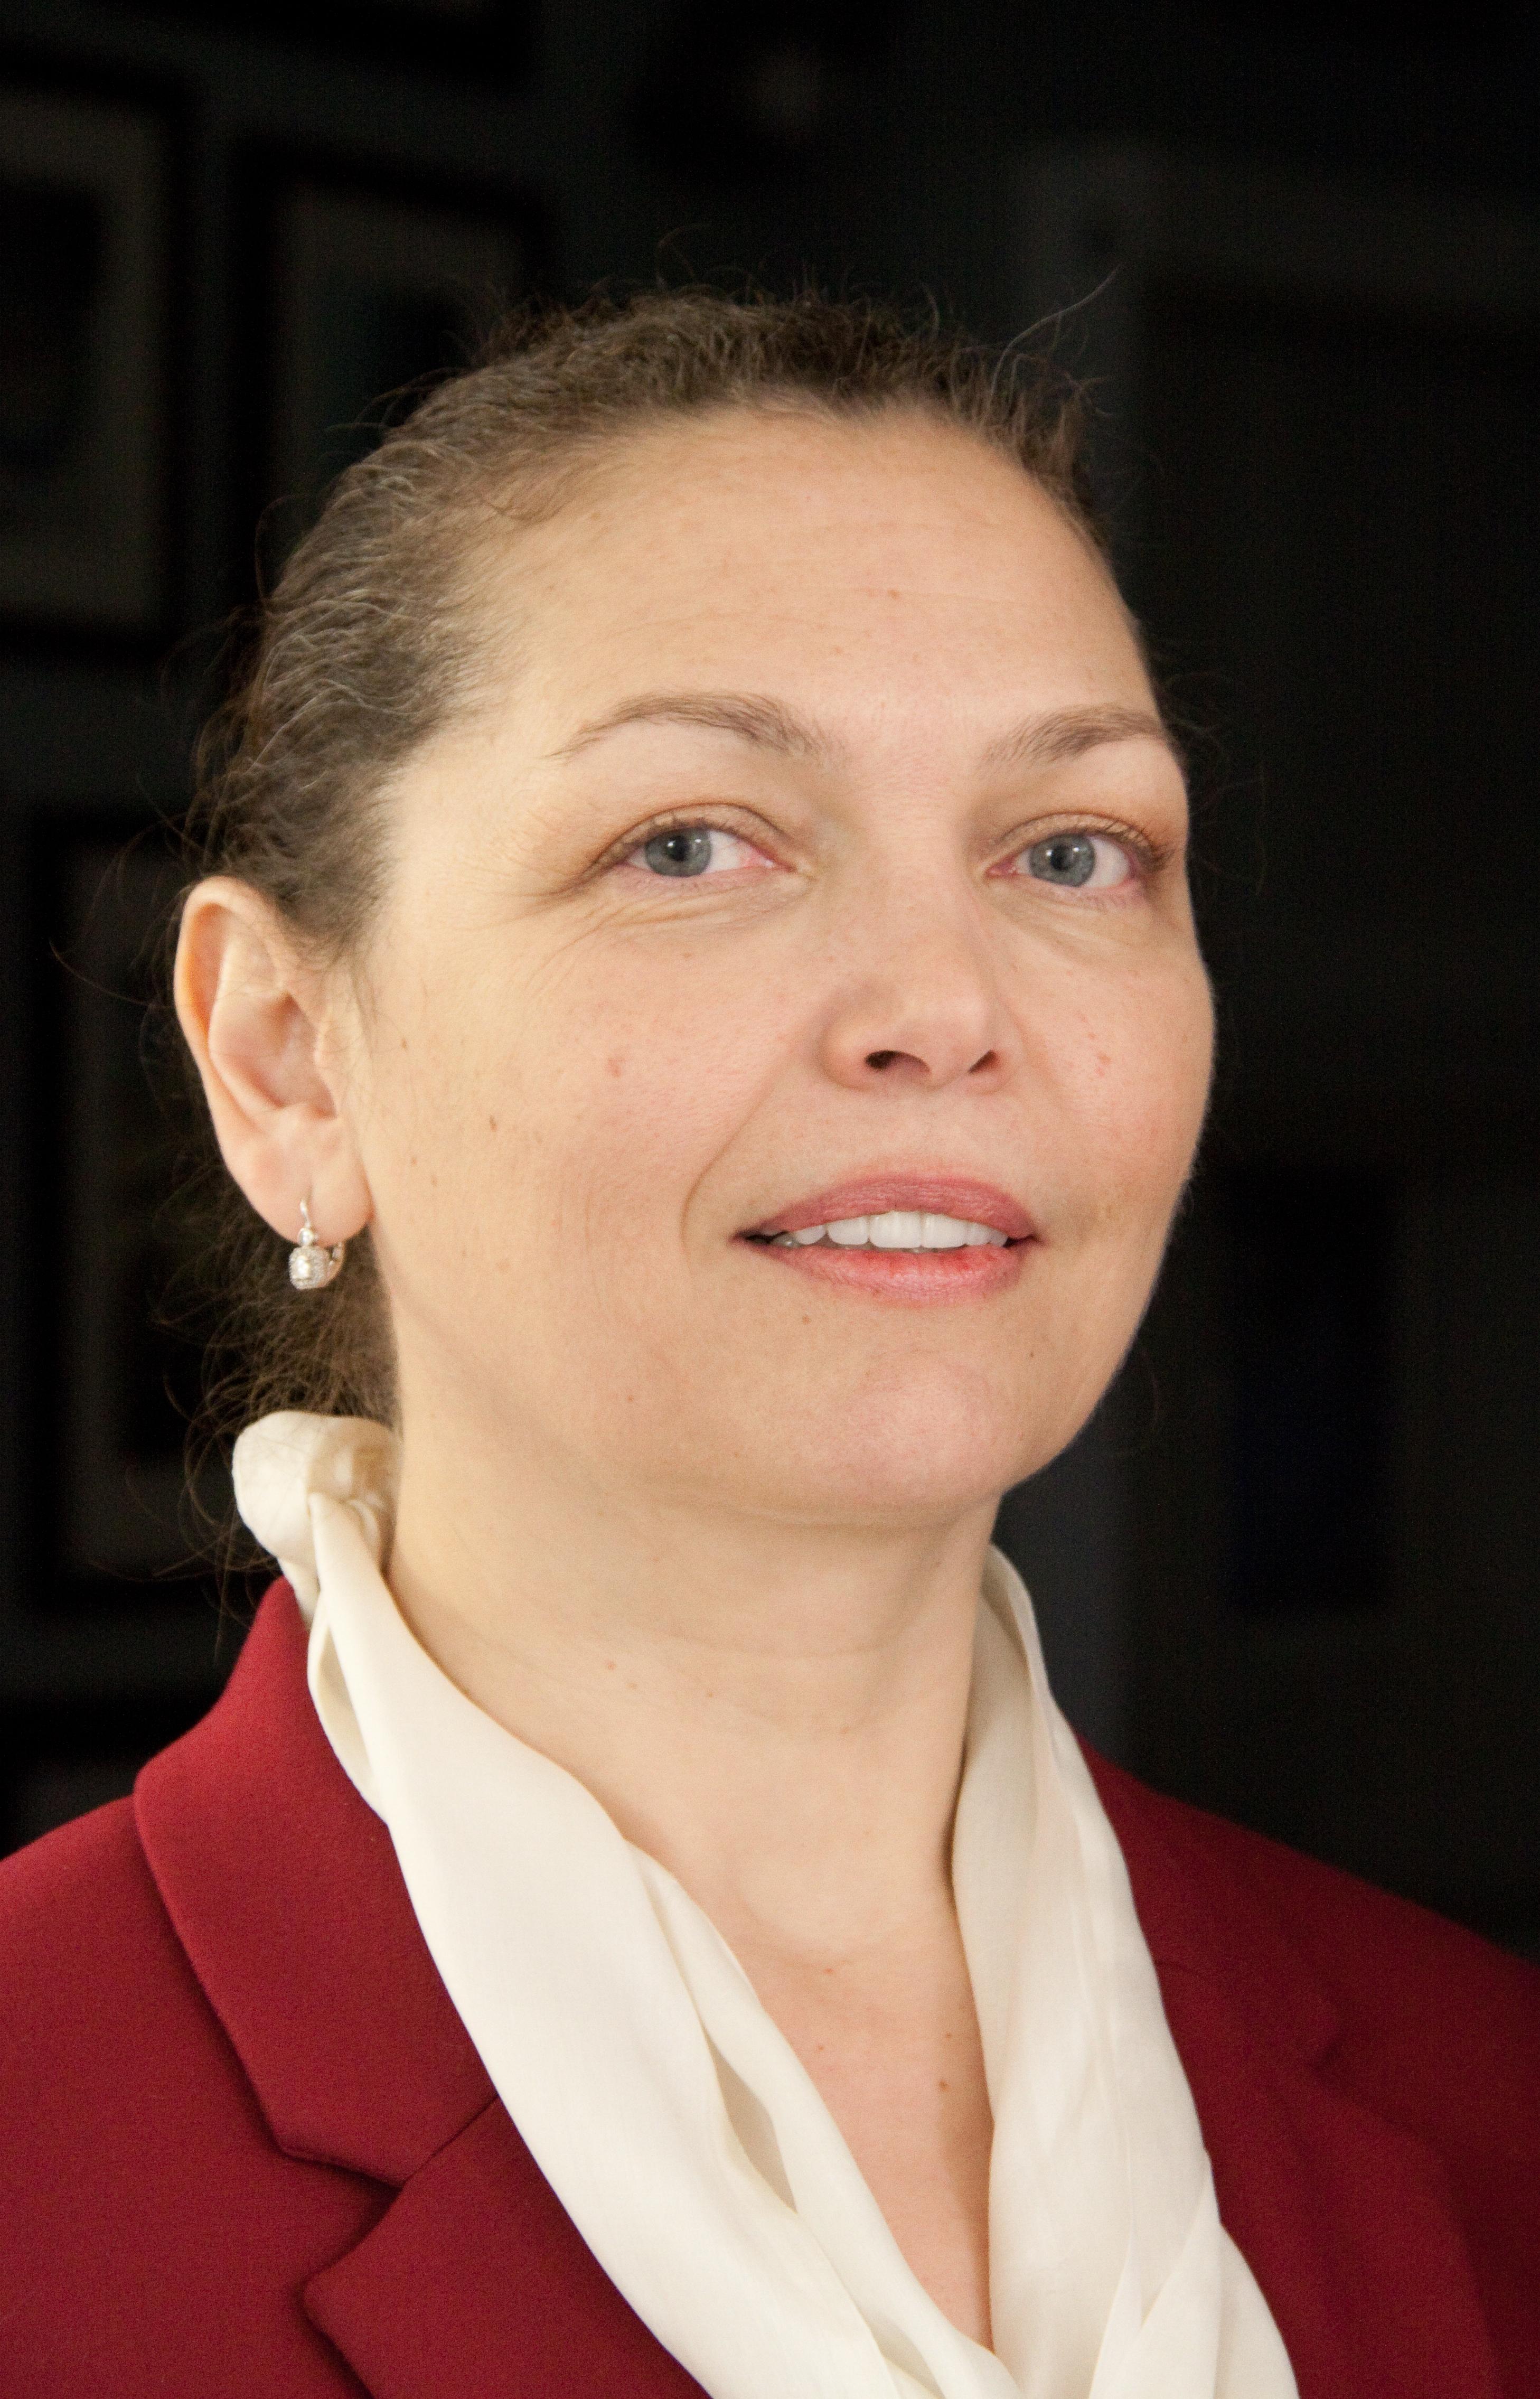 Dr. Carmen Rotaru